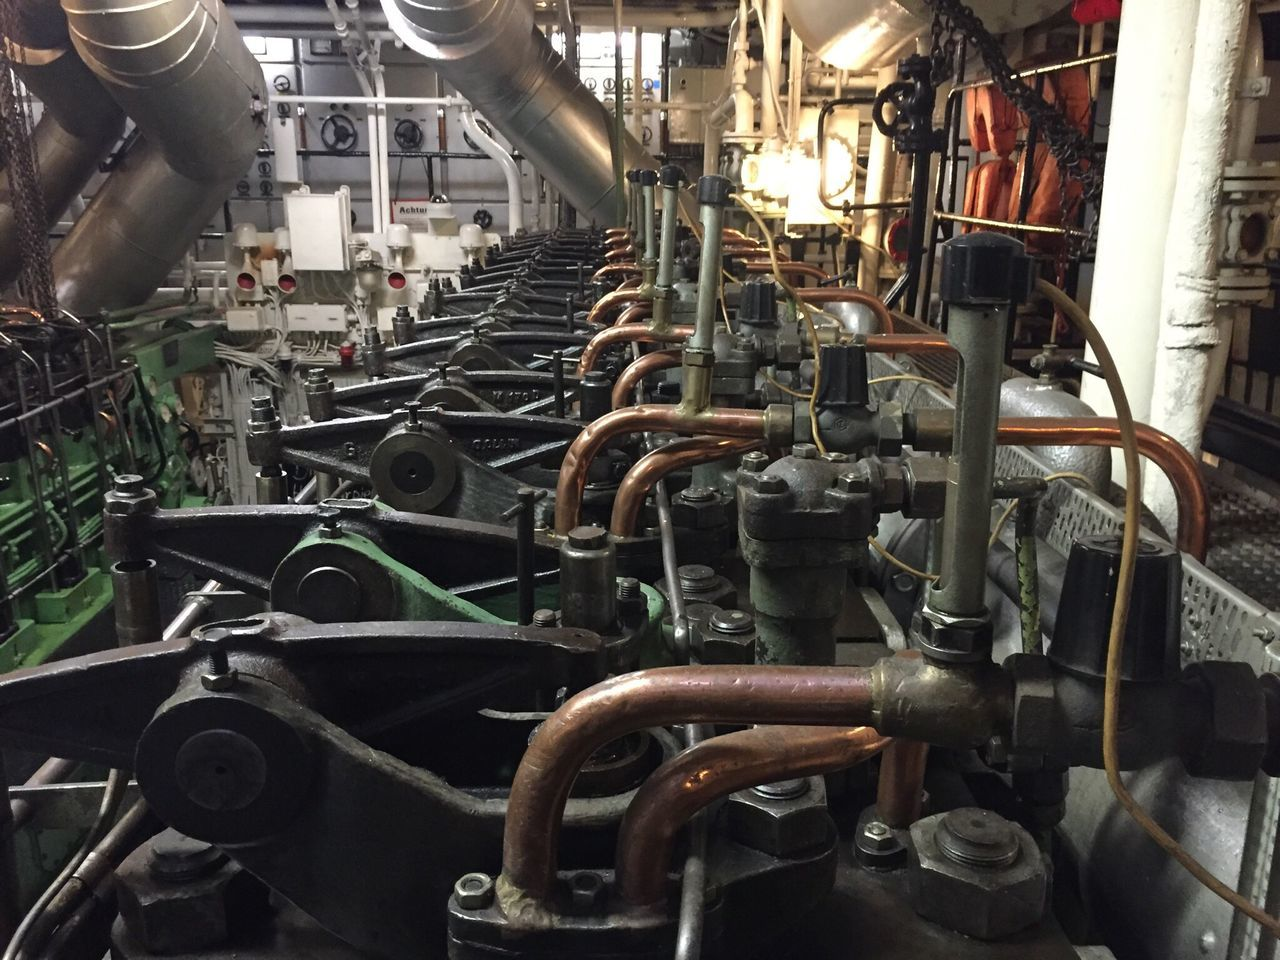 Museumsschiff Gera Museumsschiff Diesel DieselEngine Power